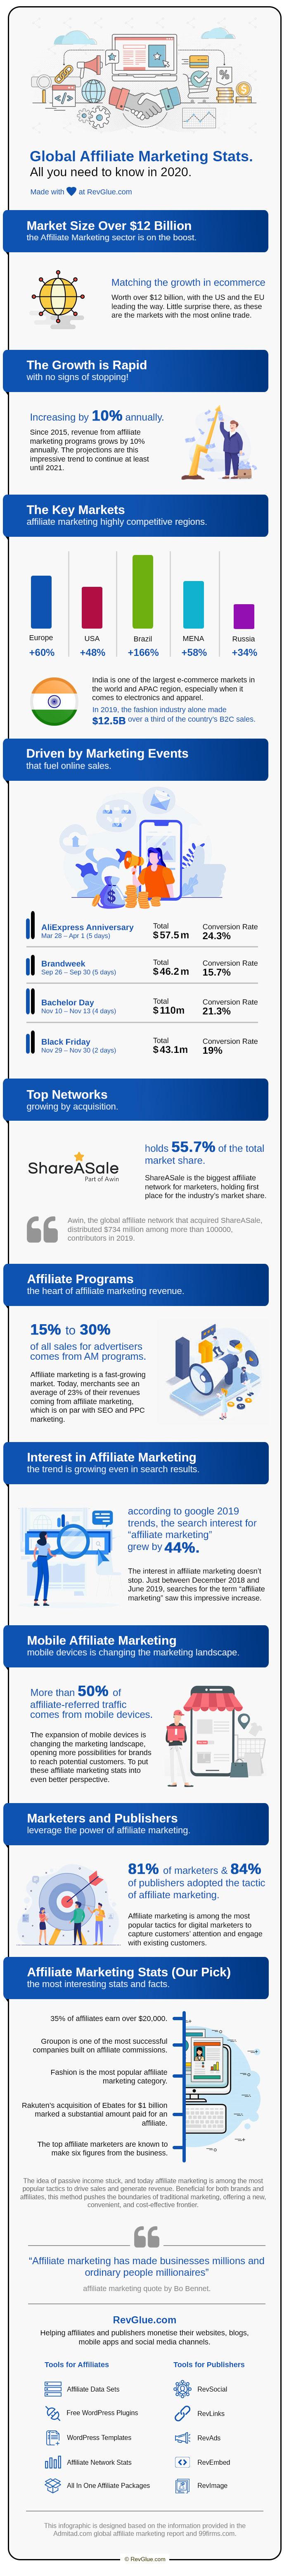 Global Affiliate Marketing Stats